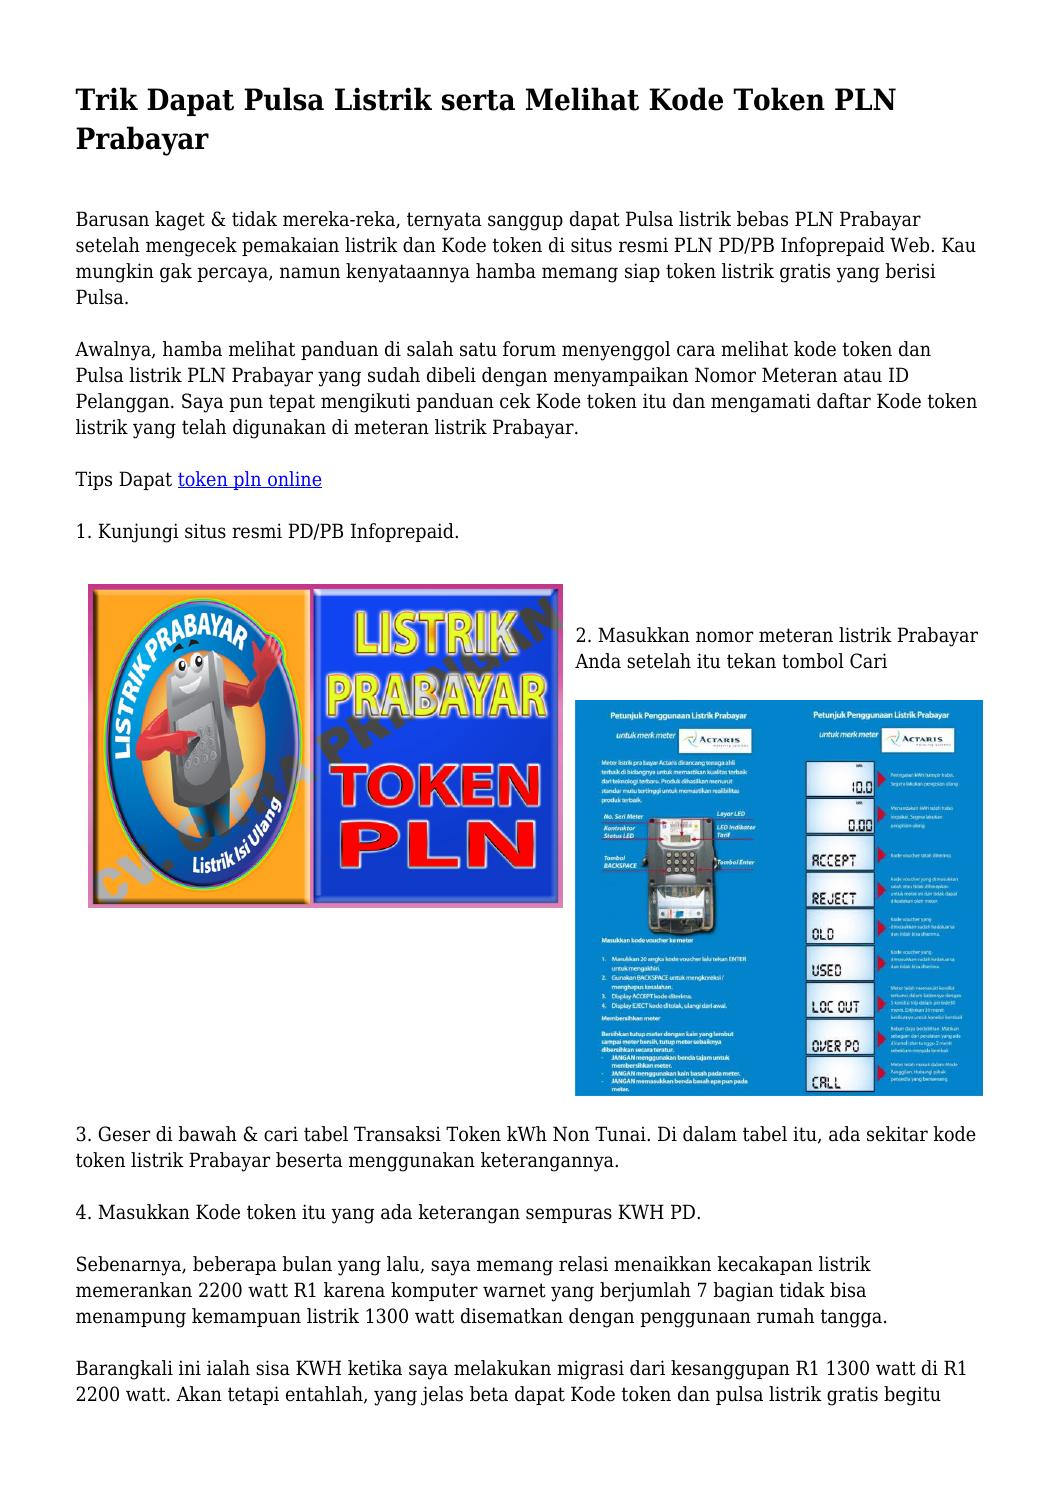 Trik Dapat Pulsa Listrik serta Melihat Kode Token PLN ...